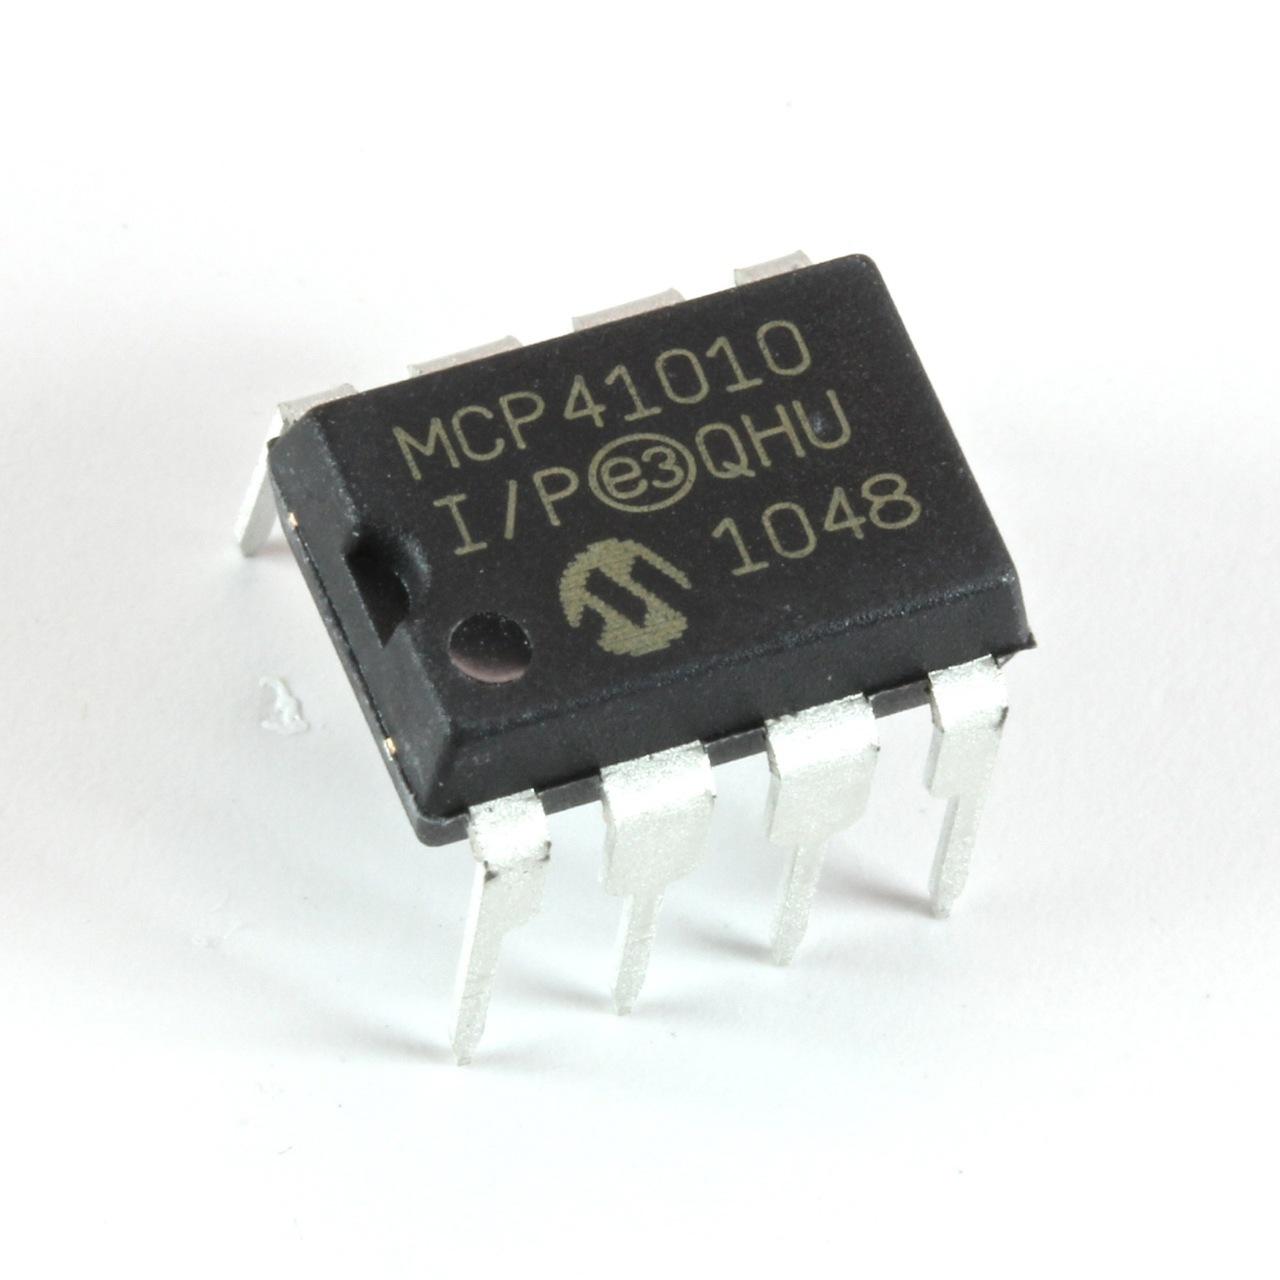 MCP41010